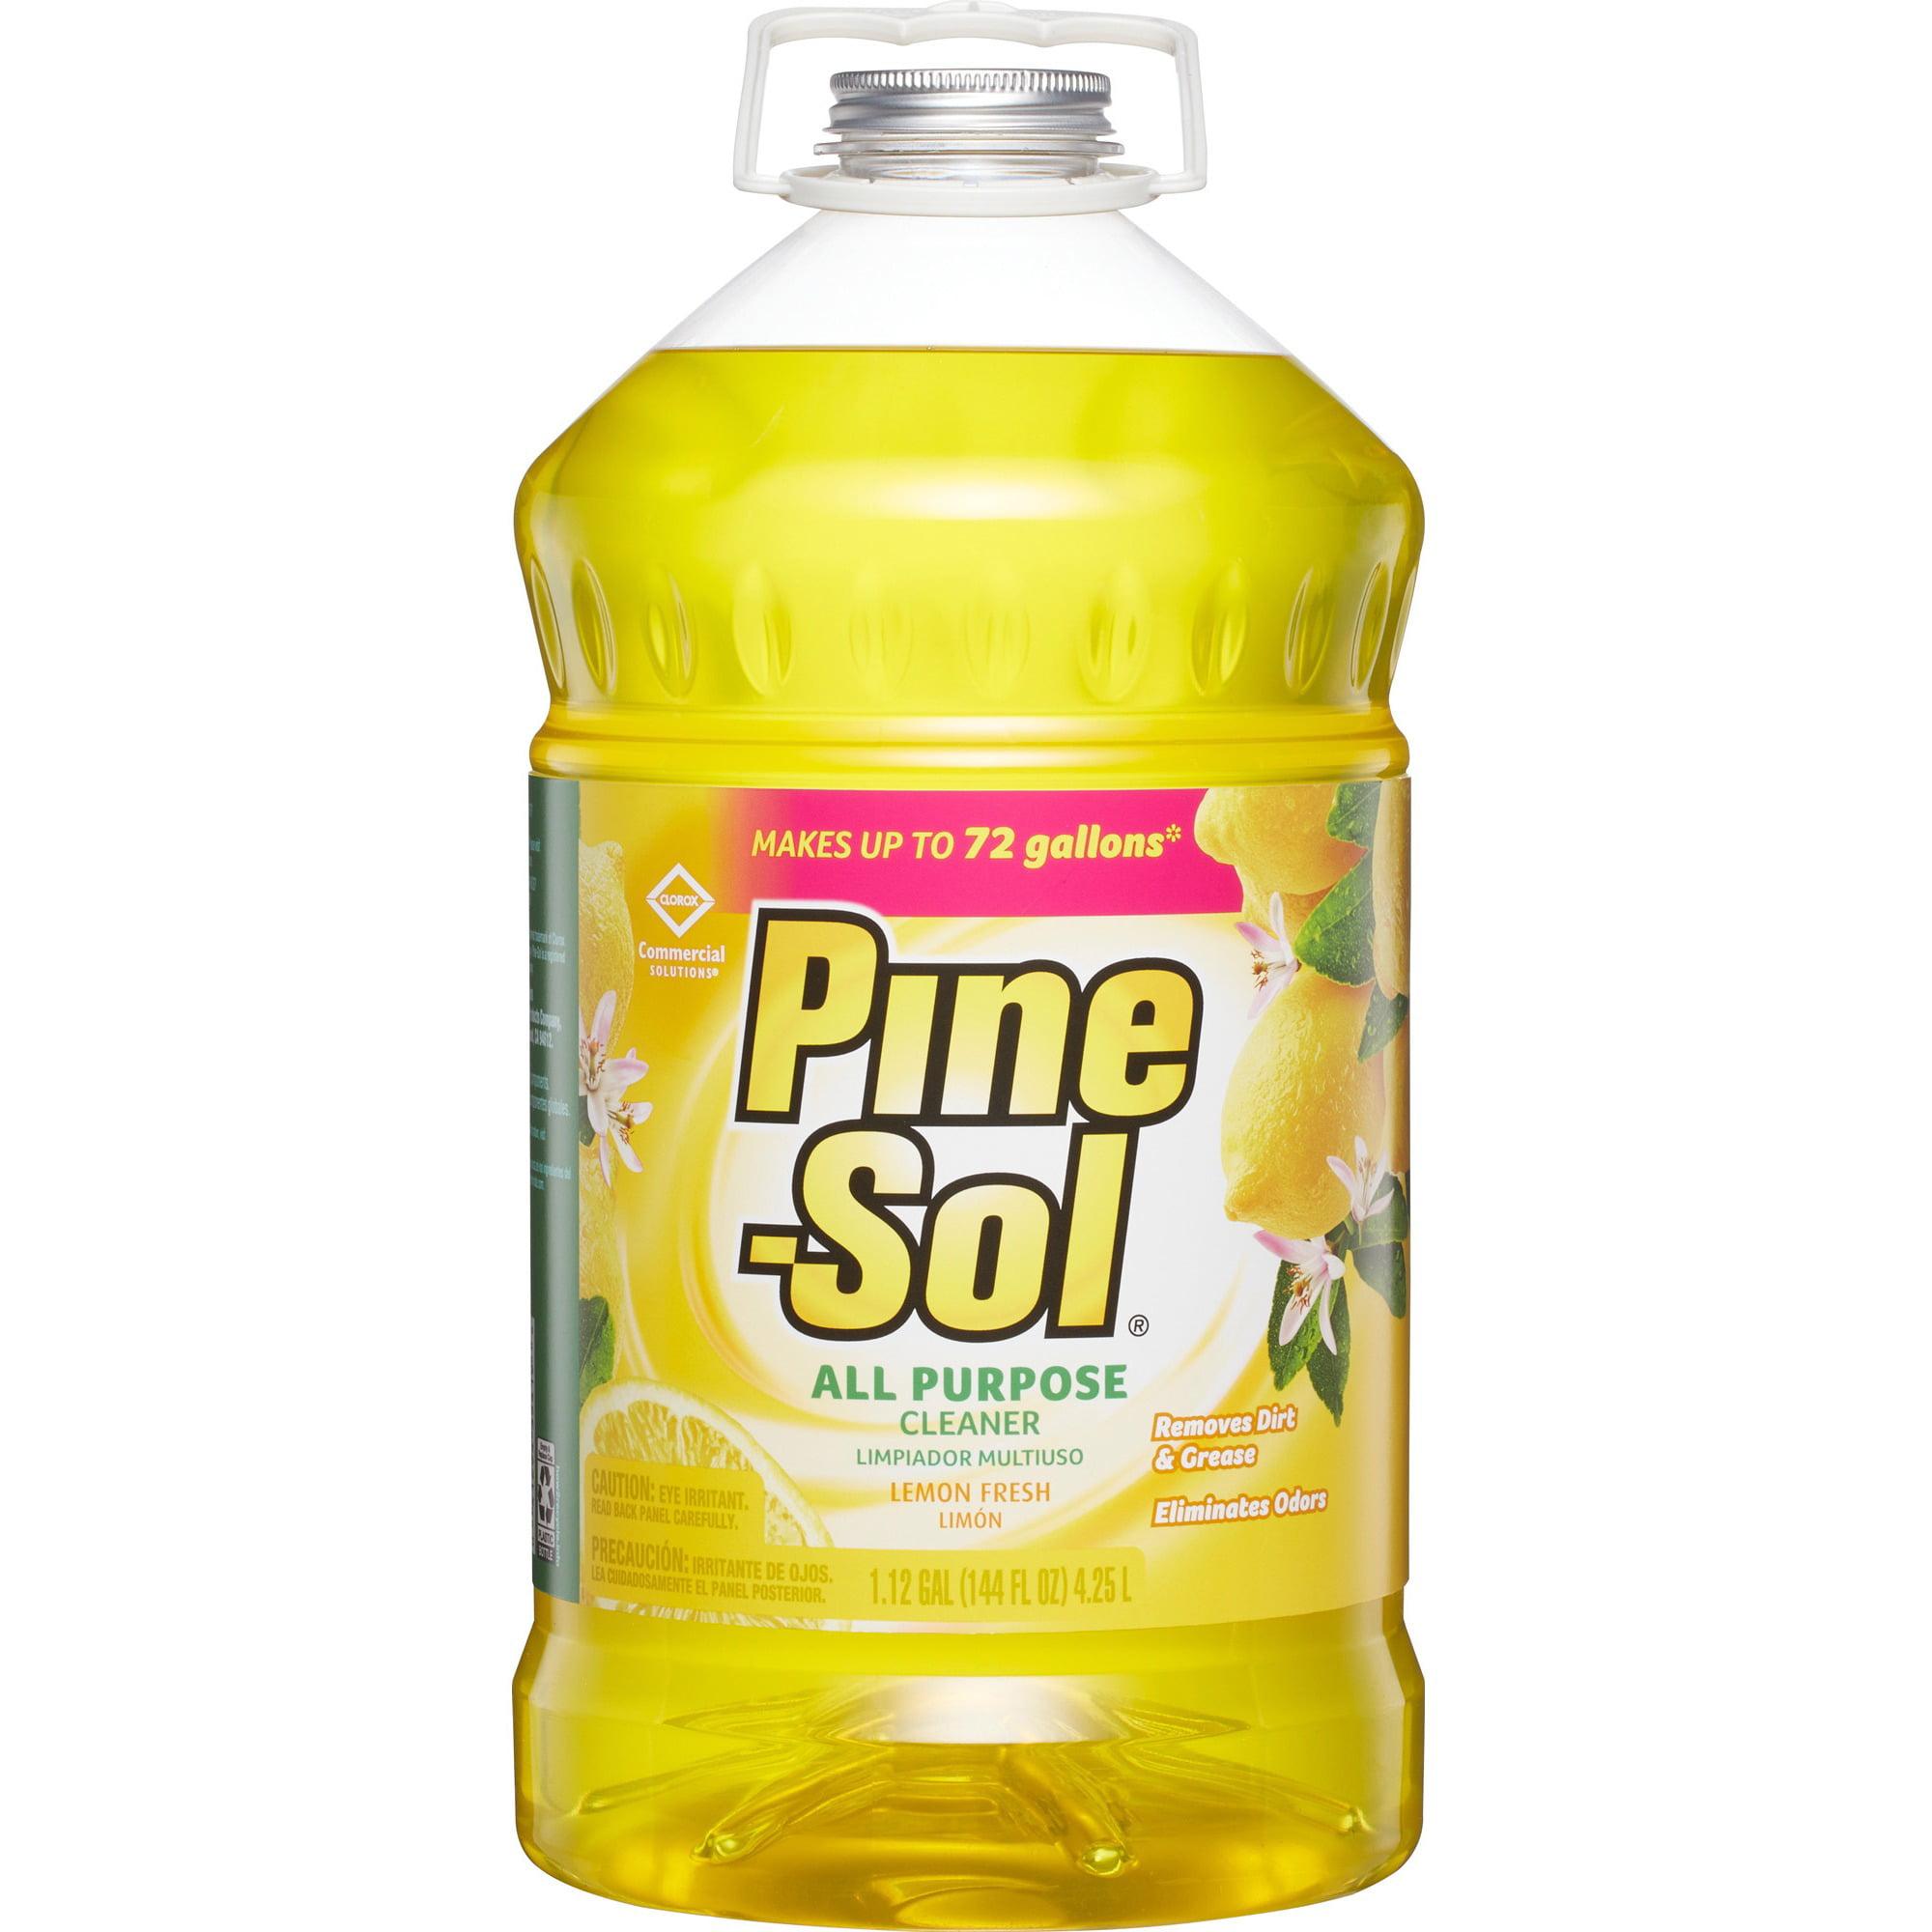 Pine-Sol, CLO35419CT, Pine-Sol All-Purpose Cleaner, 3